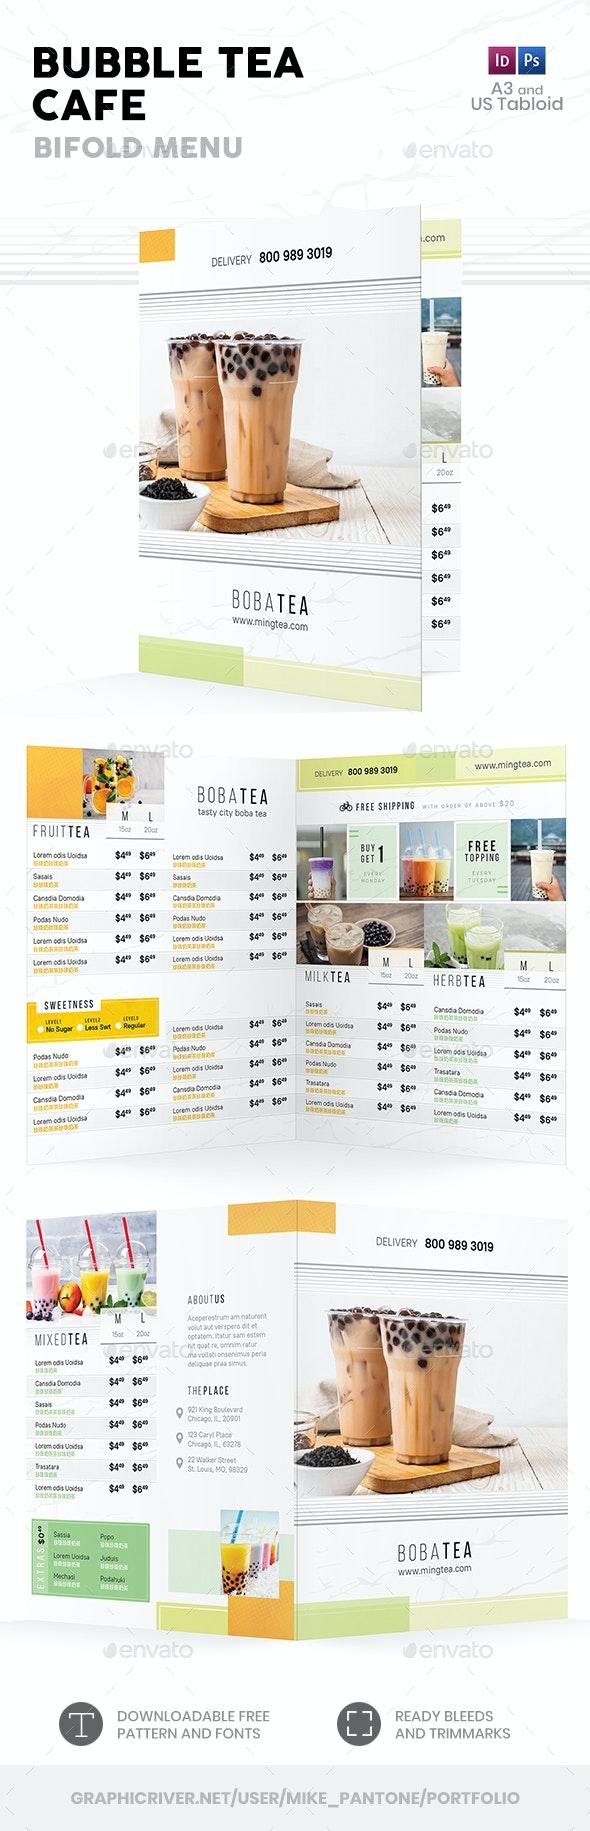 Bubble Tea Bifold / Halffold Menu 4 - Food Menus Print Templates